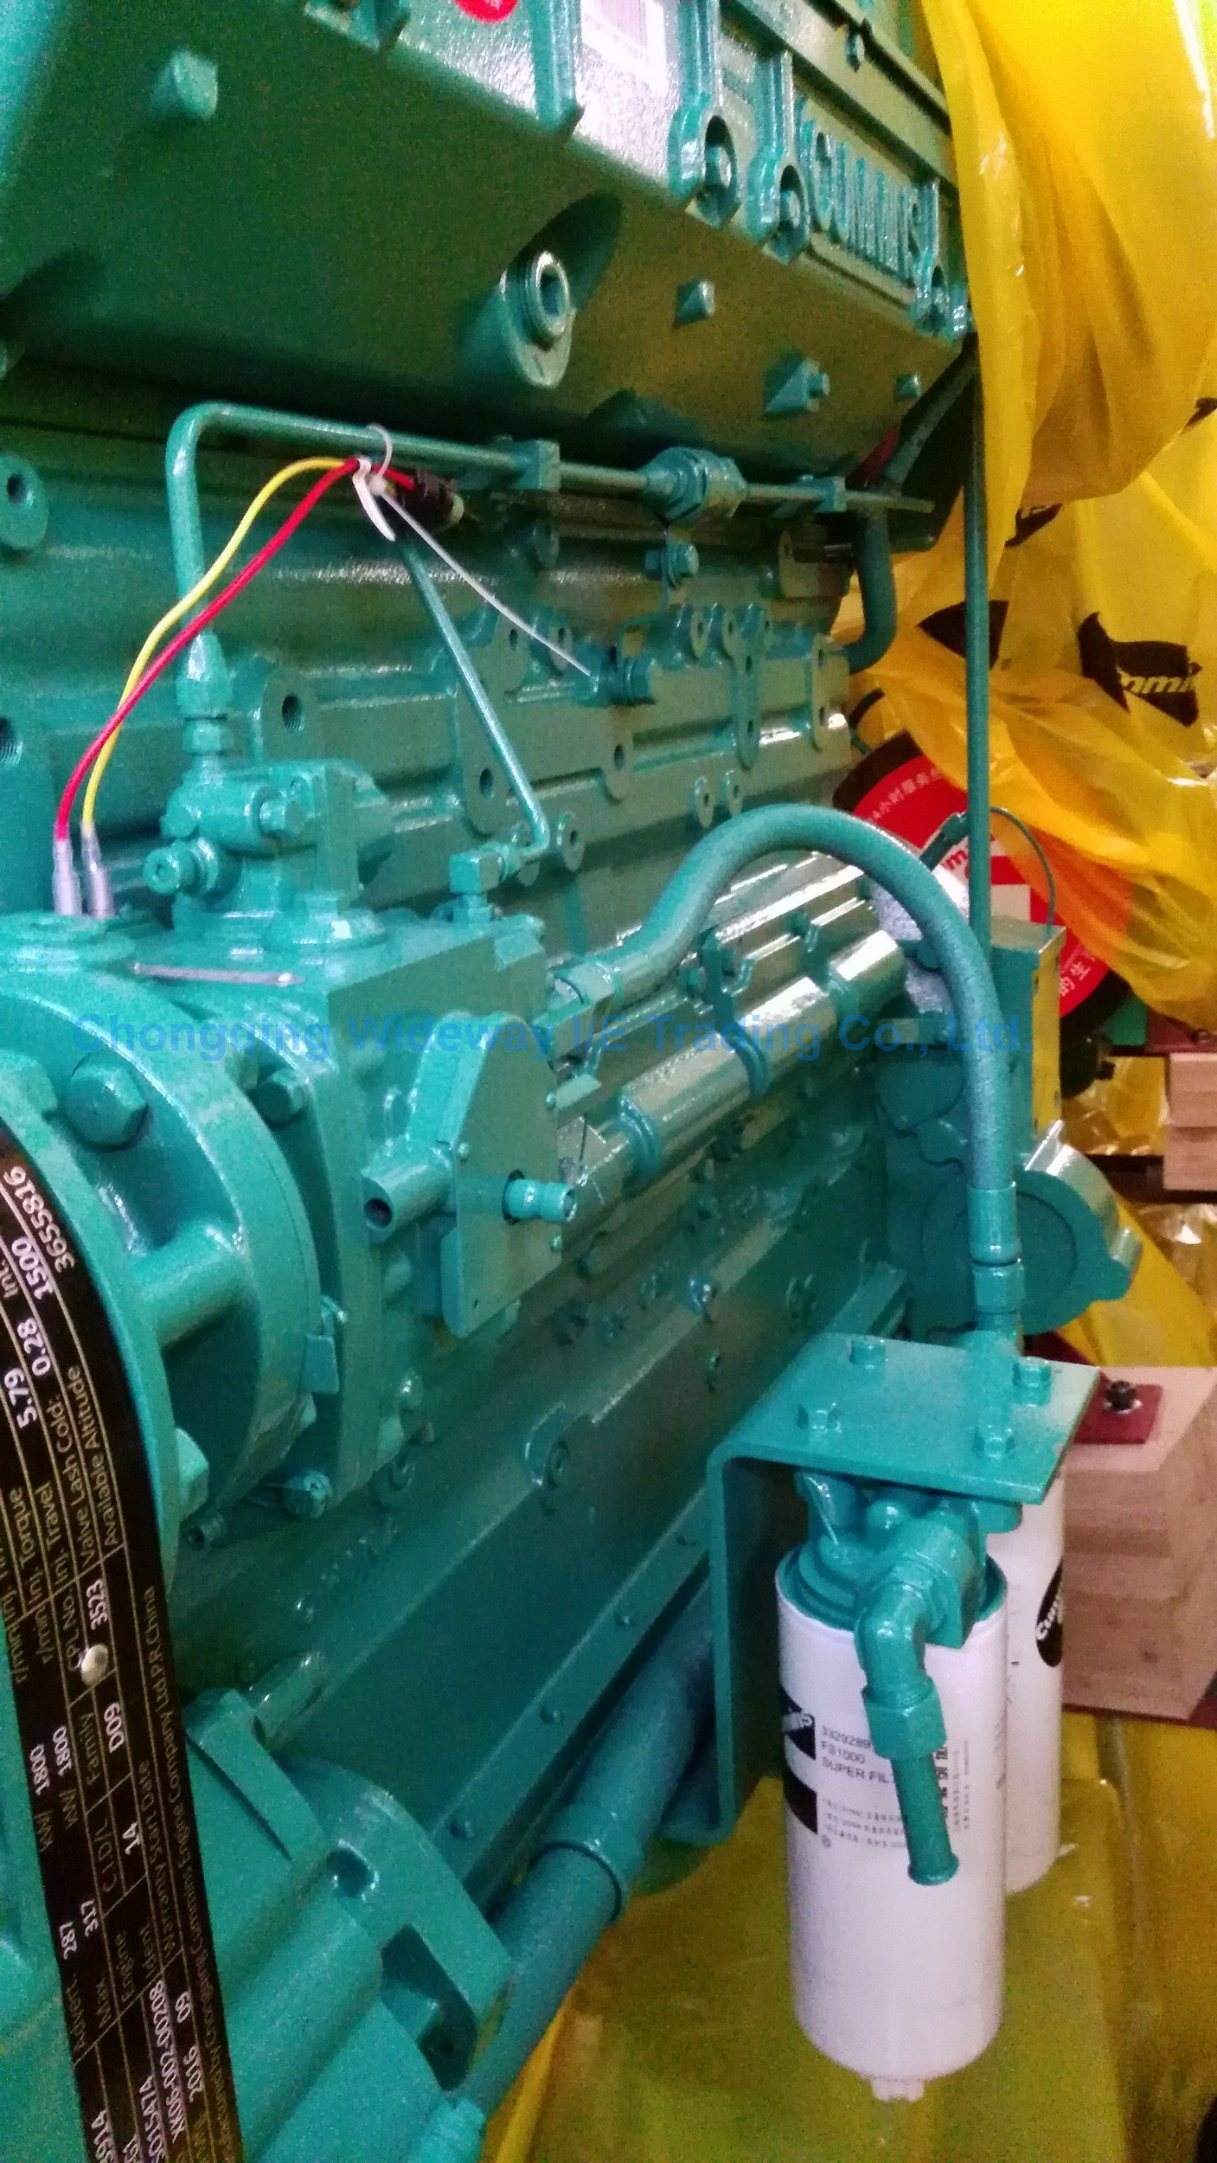 Genuine Original Ccec Nta855-G1 Cummins Diesel Engine for Generator Set